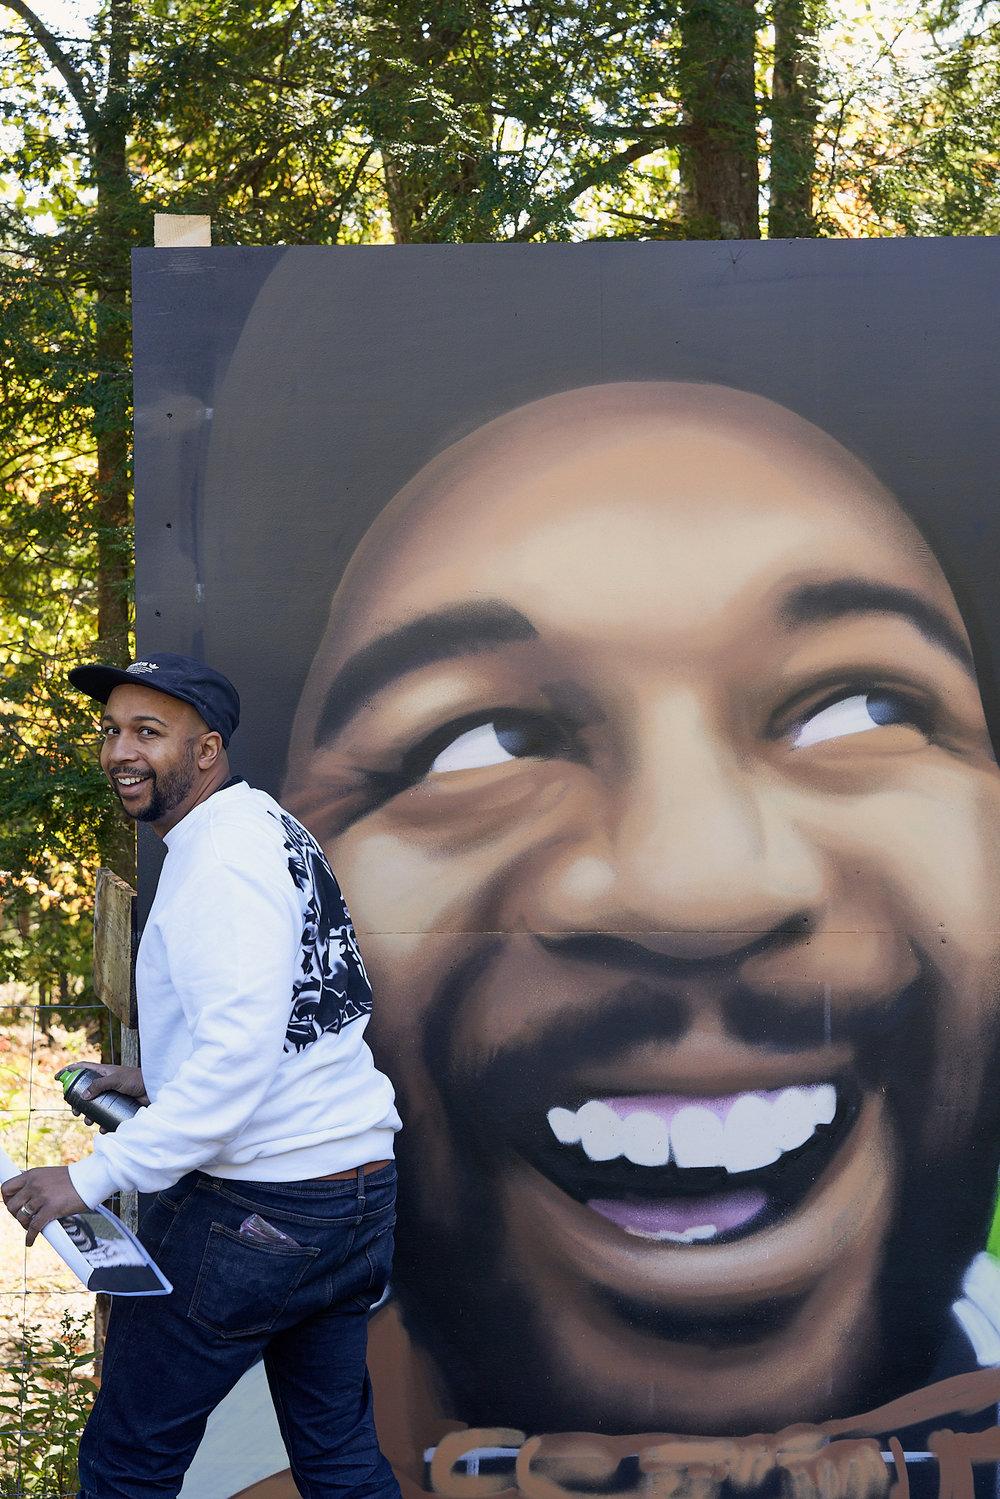 Artist    Ryan Woods    spray paints a self-portrait mural.